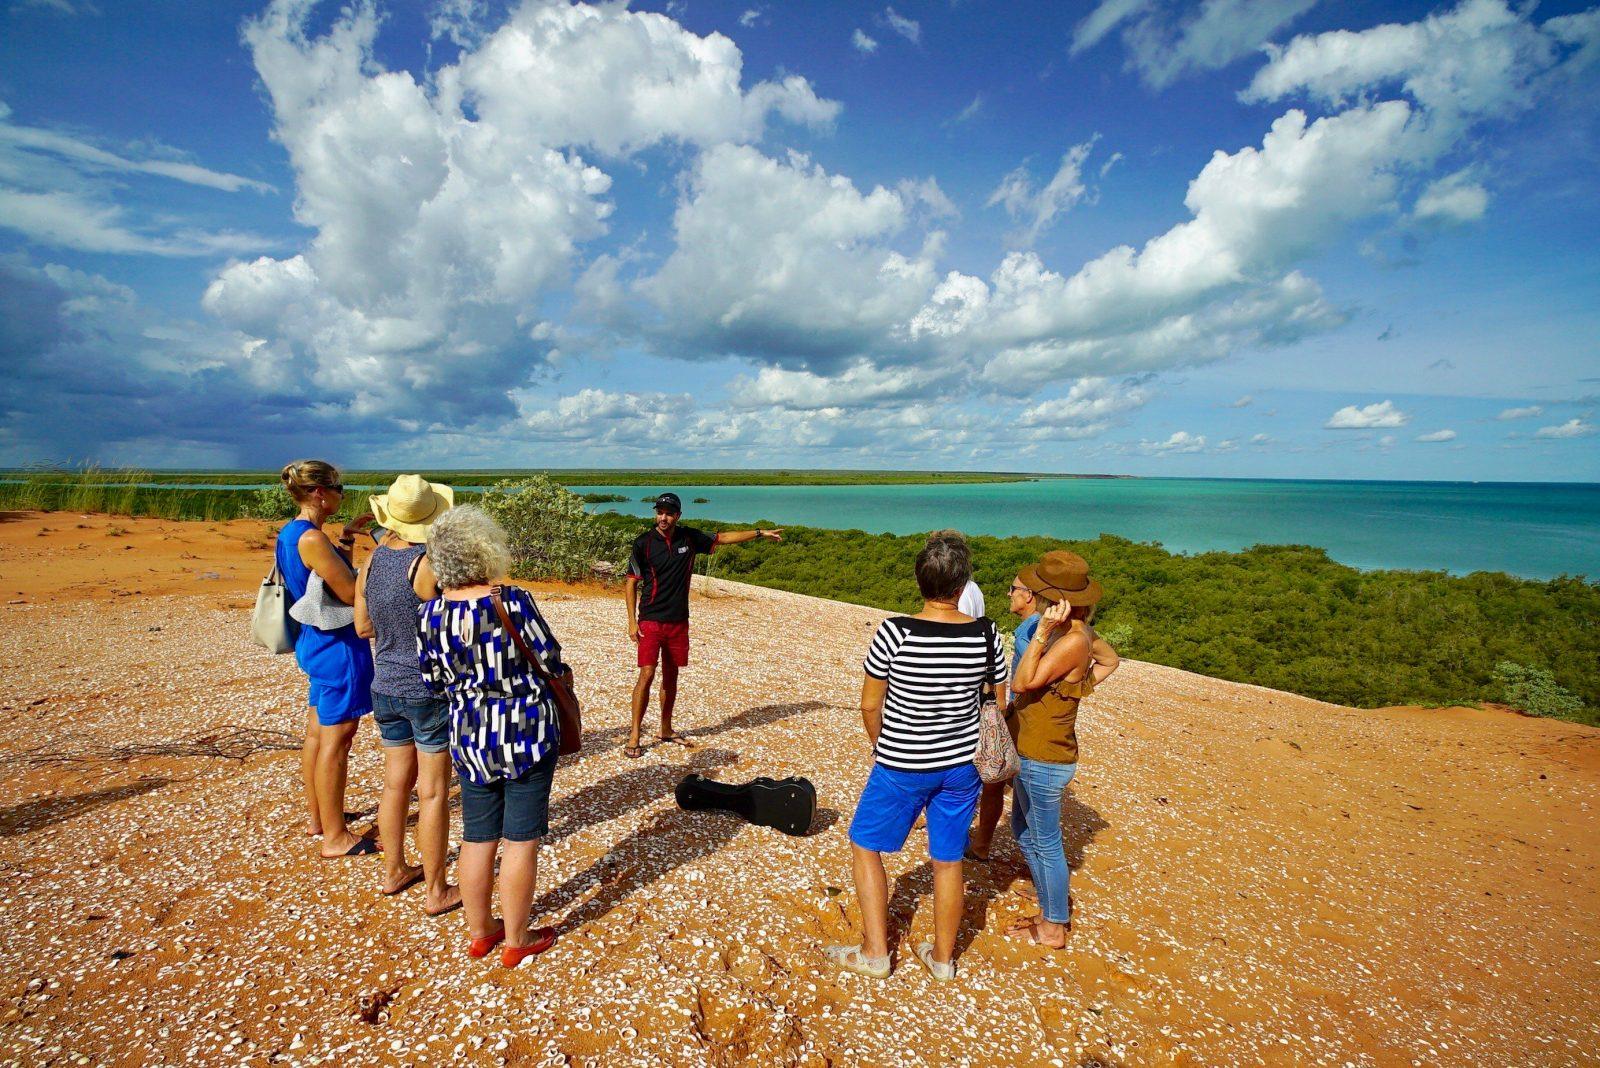 Narlijia Cultural Tours, Broome, Western Australia